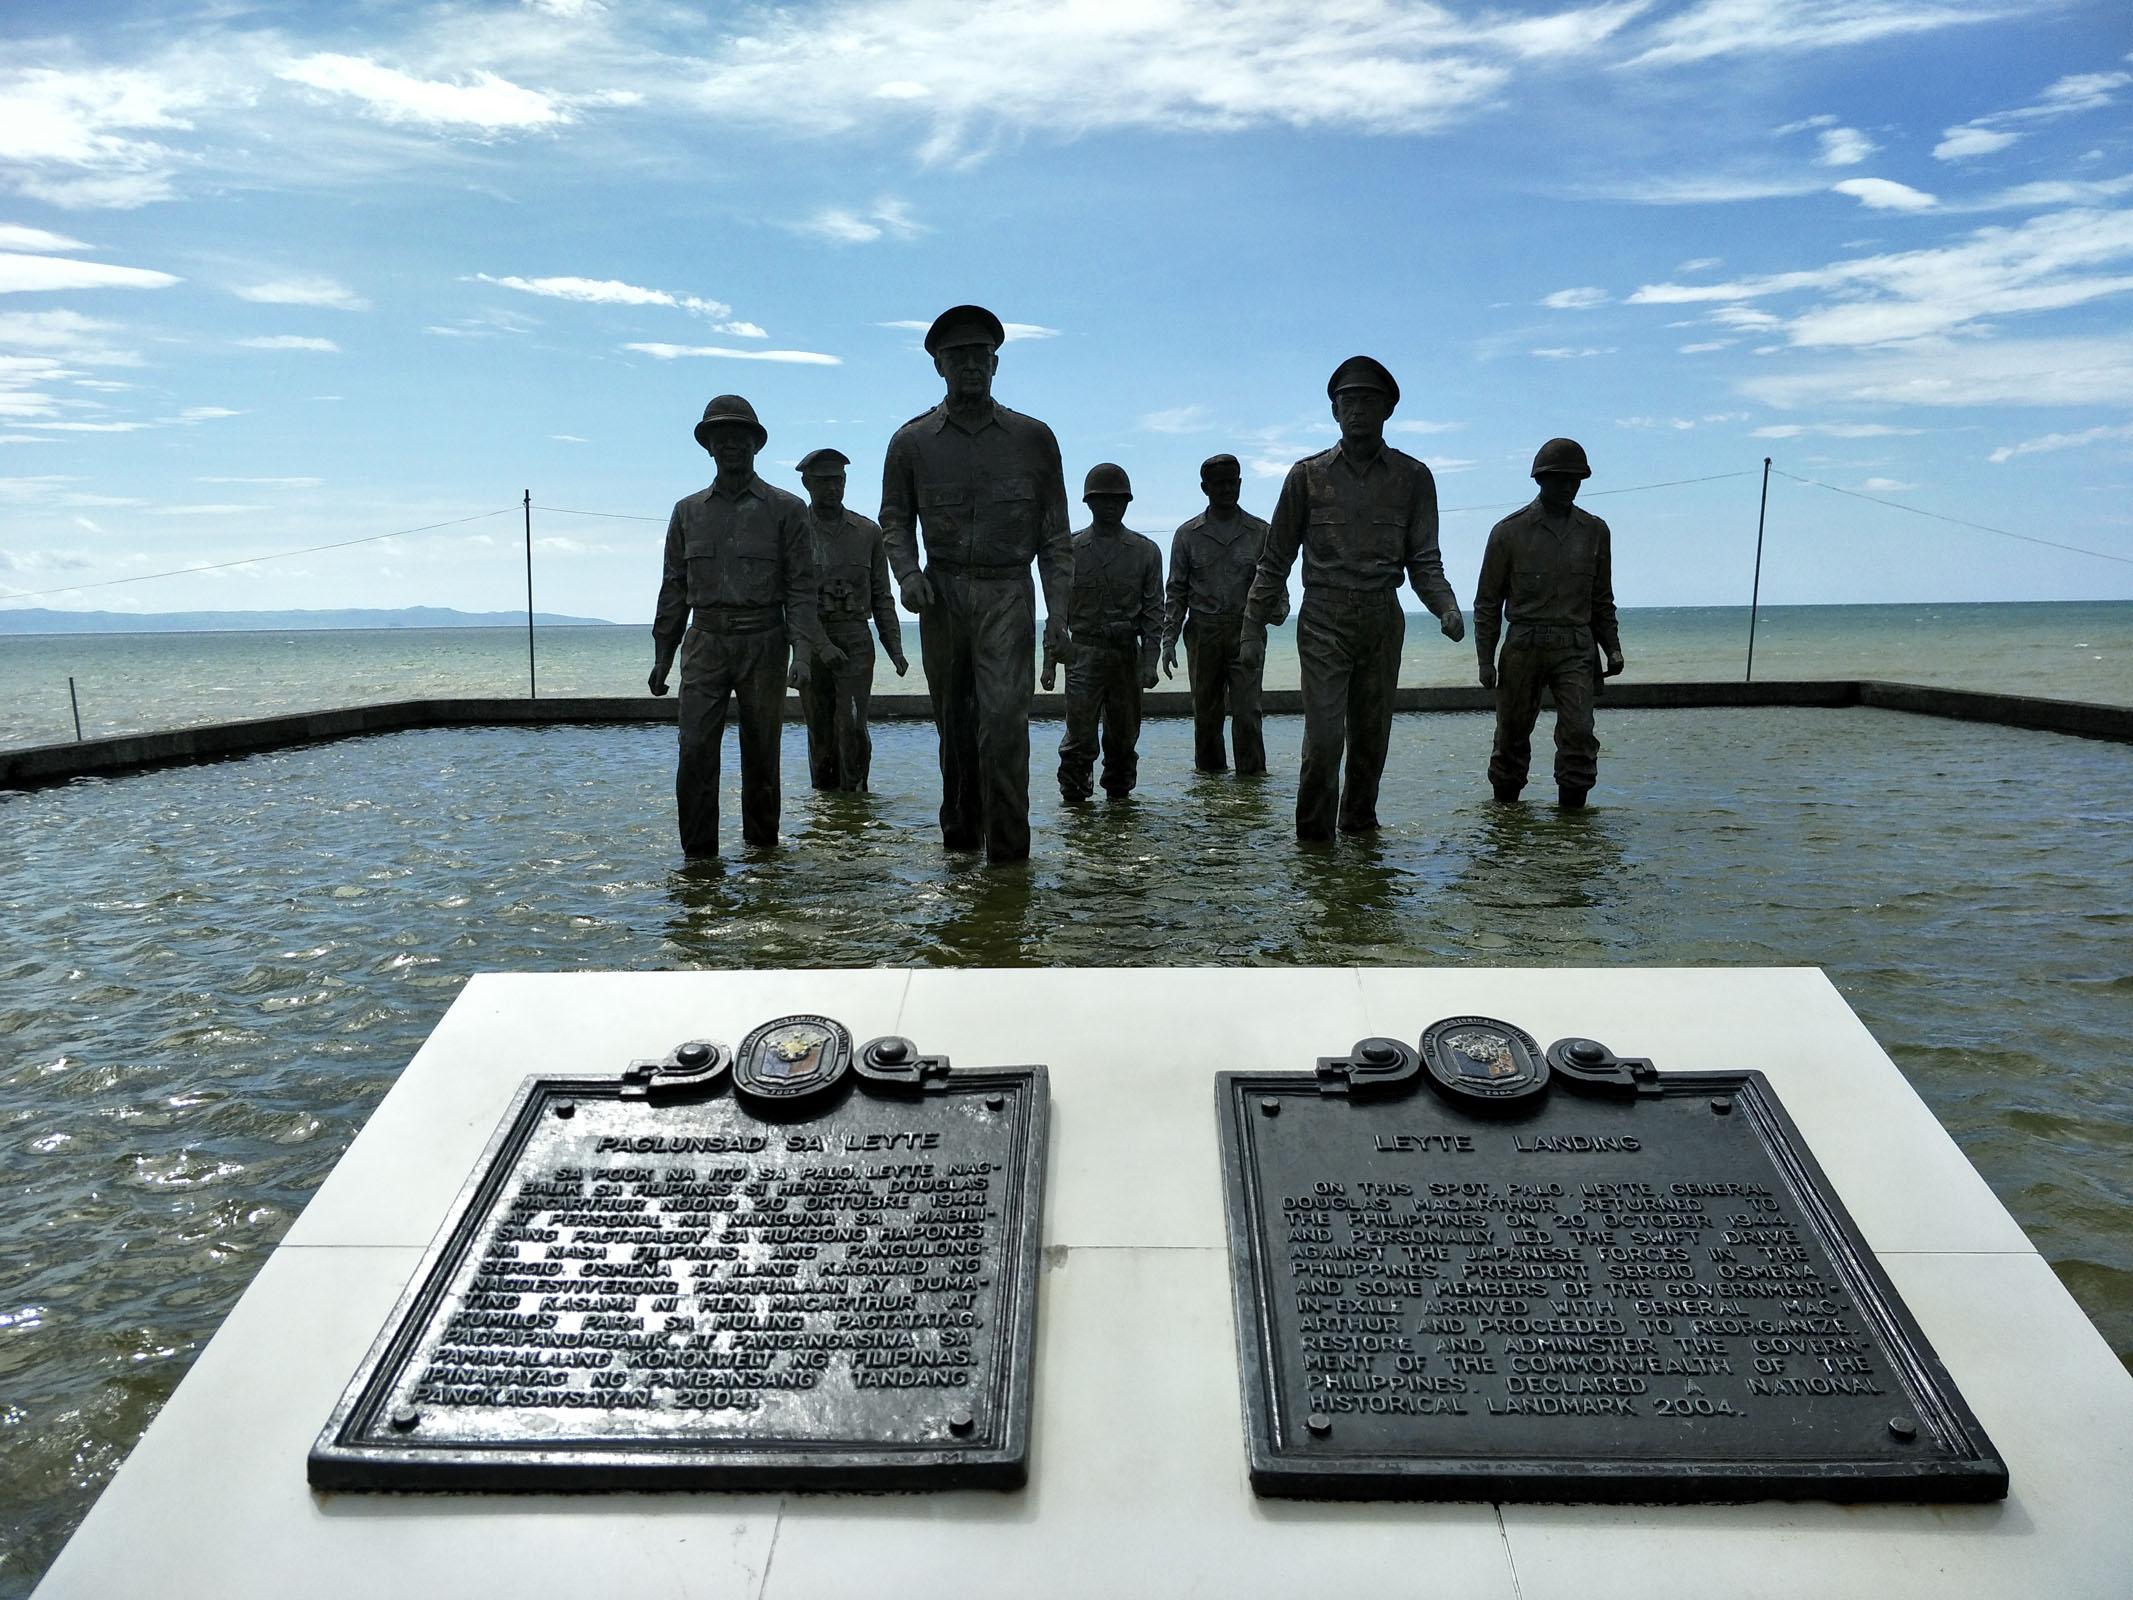 Randolf Alcober - MacArthur's Landing - Tacloban City, Philippines.jpg